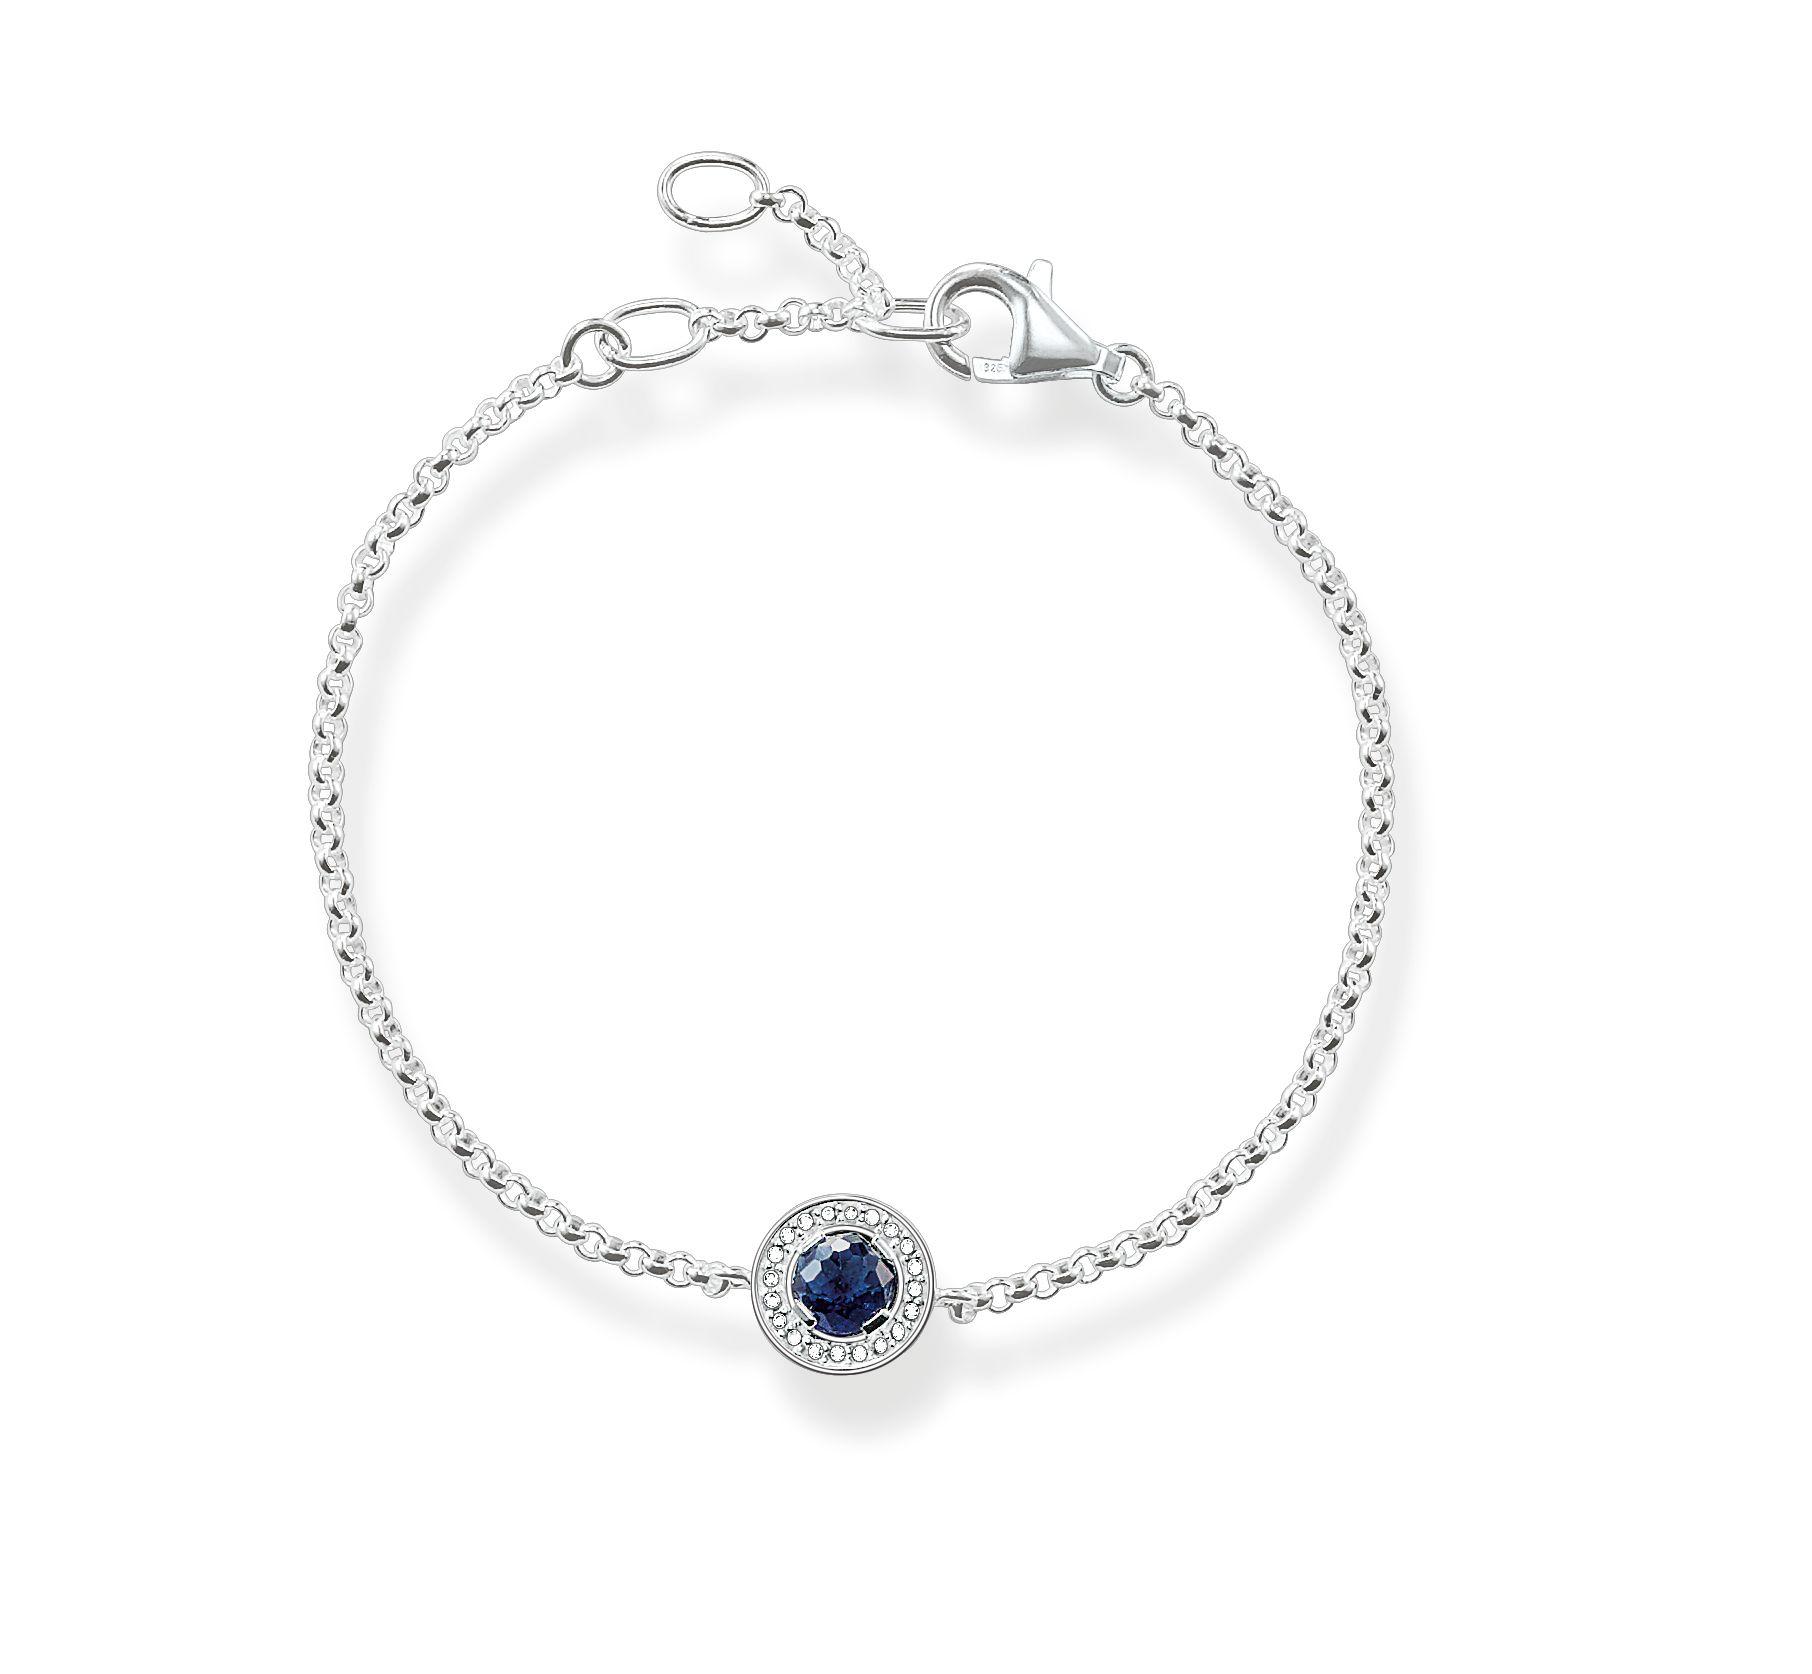 Thomas Sabo Light Of Luna Blue Corundum Bracelet In